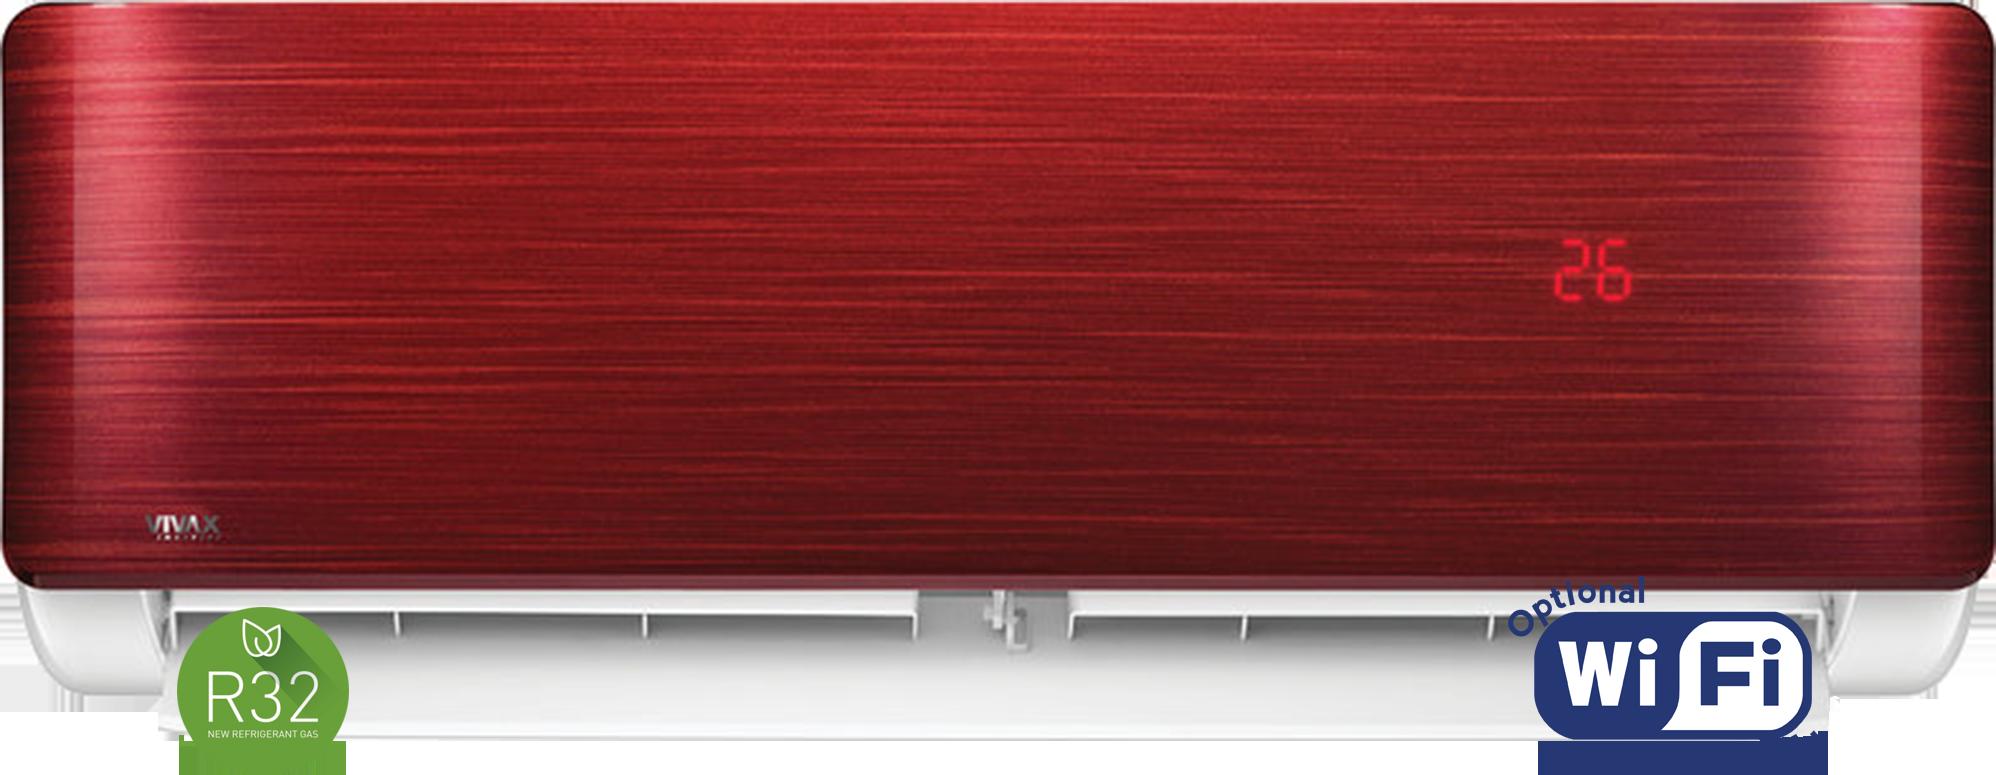 ACP-12CH35AERI R32 Red